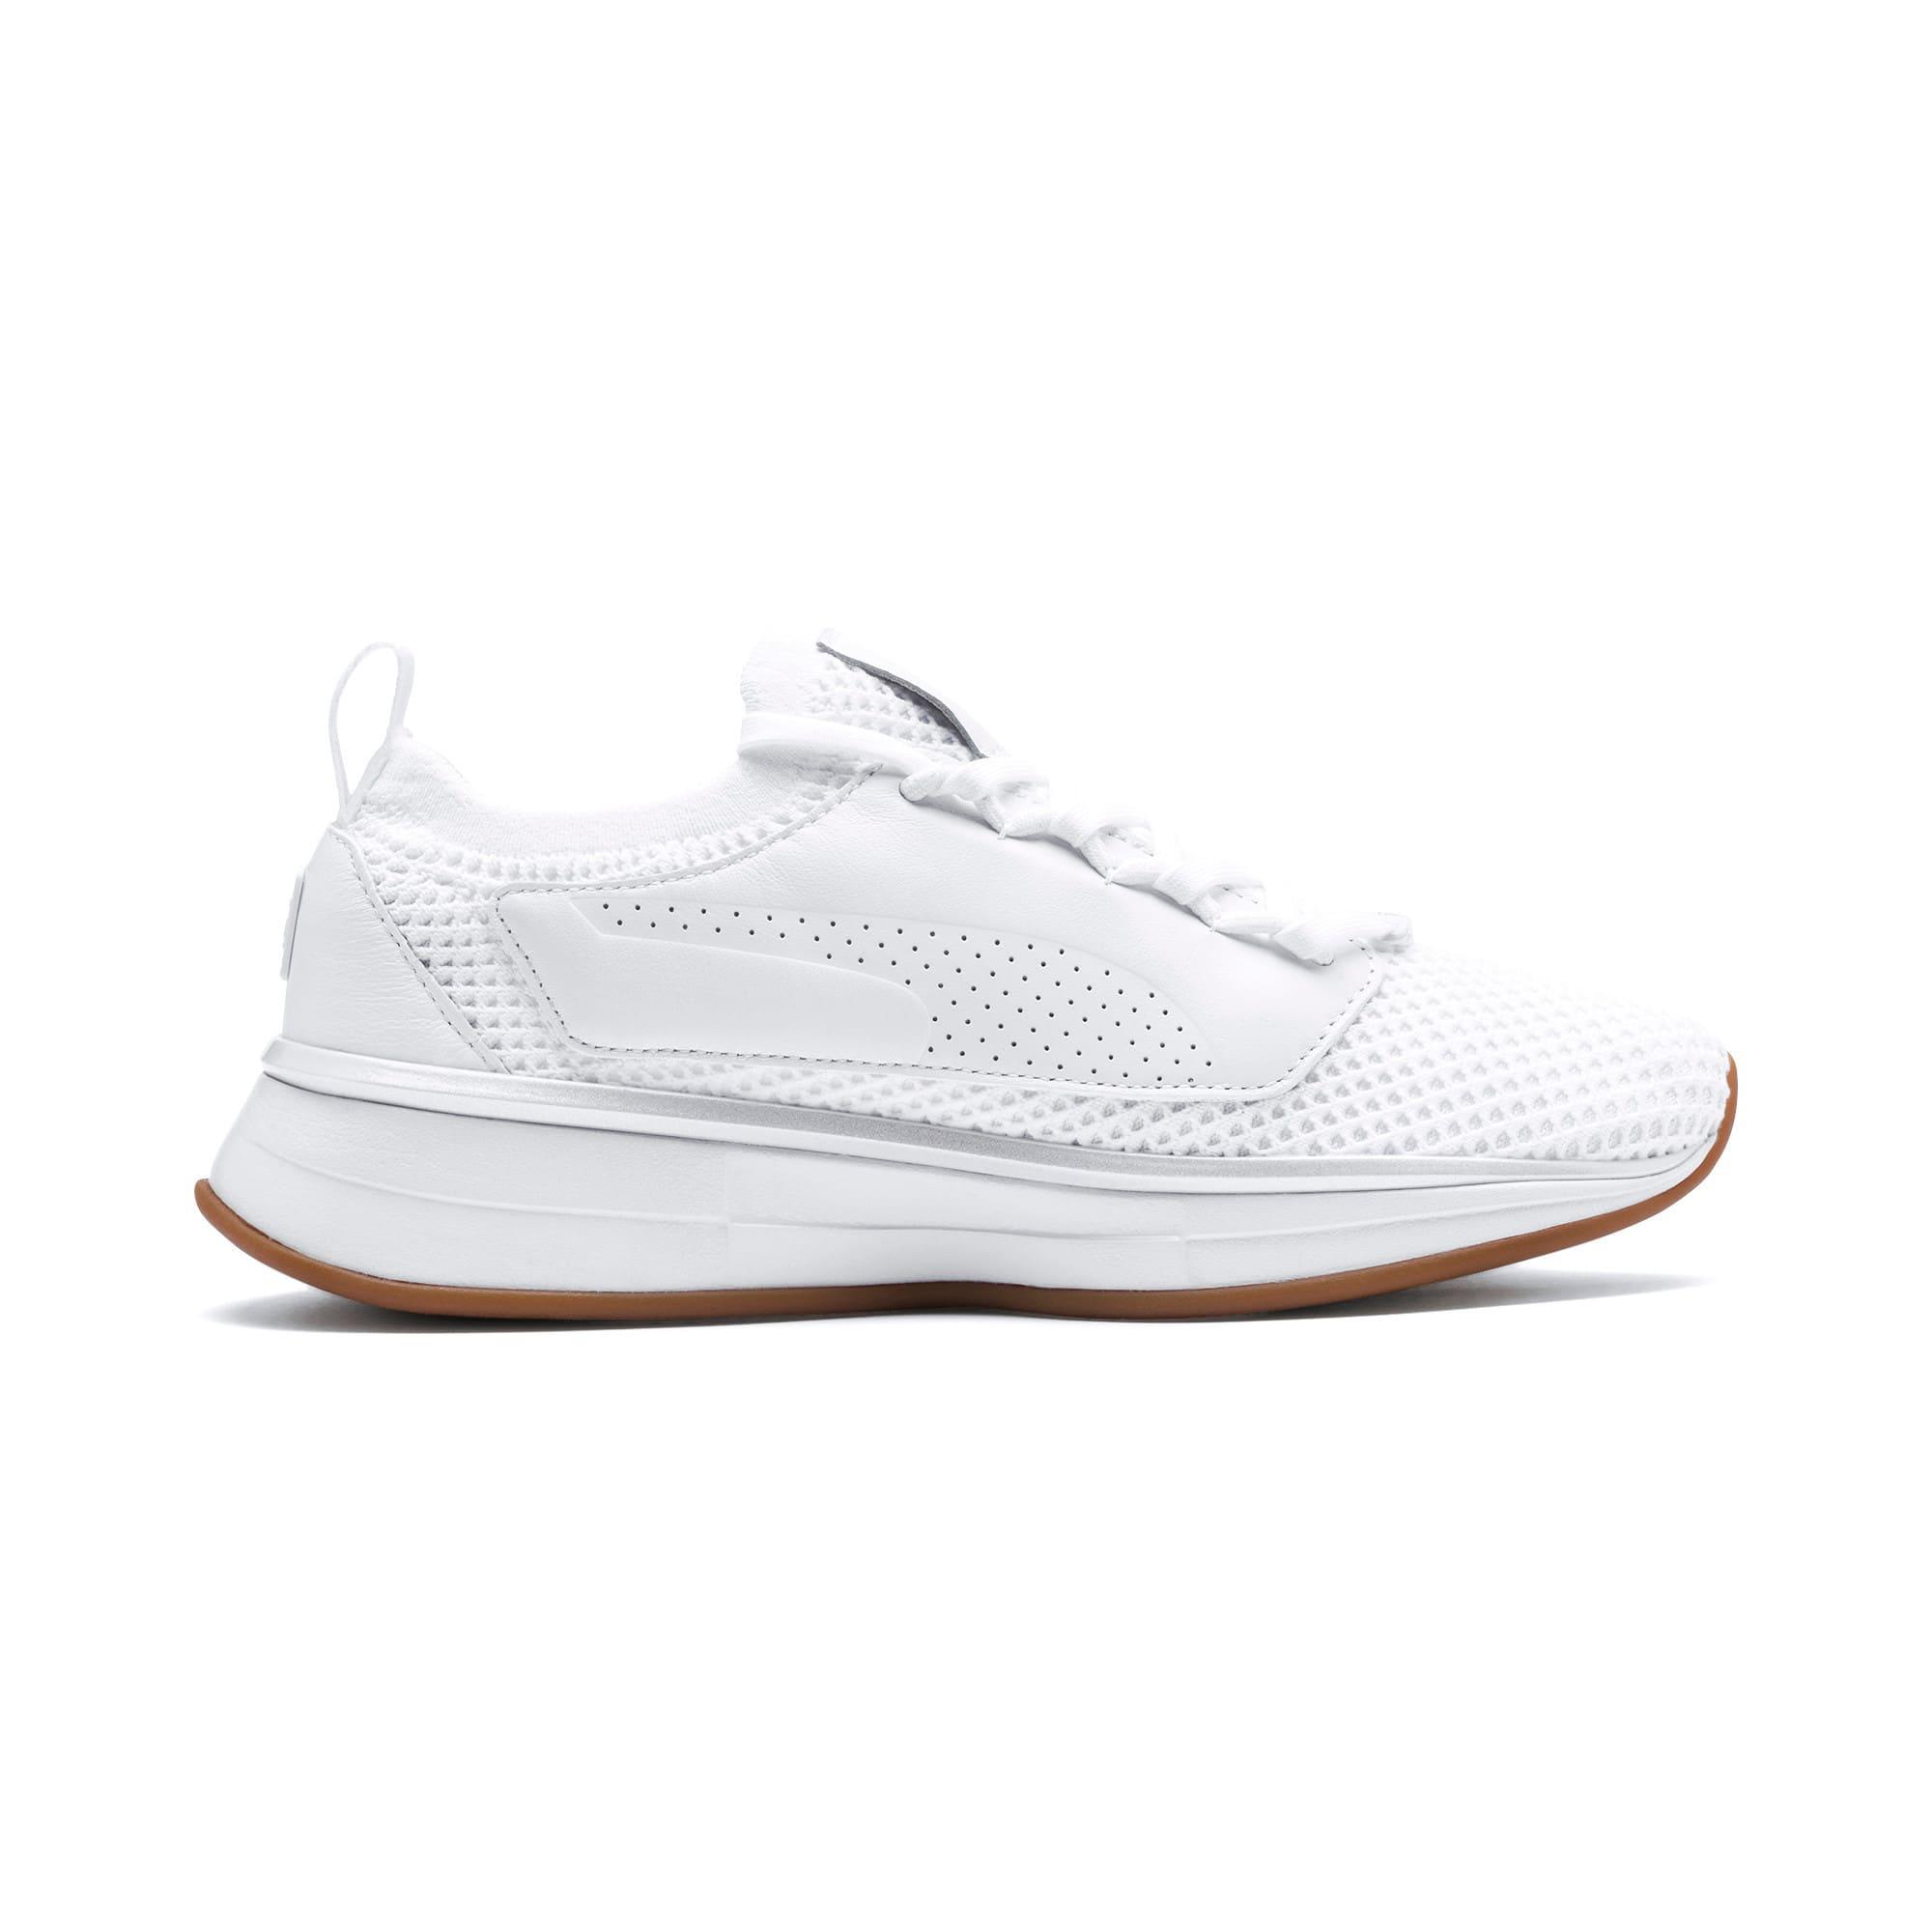 Thumbnail 3 of PUMA x SELENA GOMEZ Runner Women's Training Shoes, Puma White, medium-IND